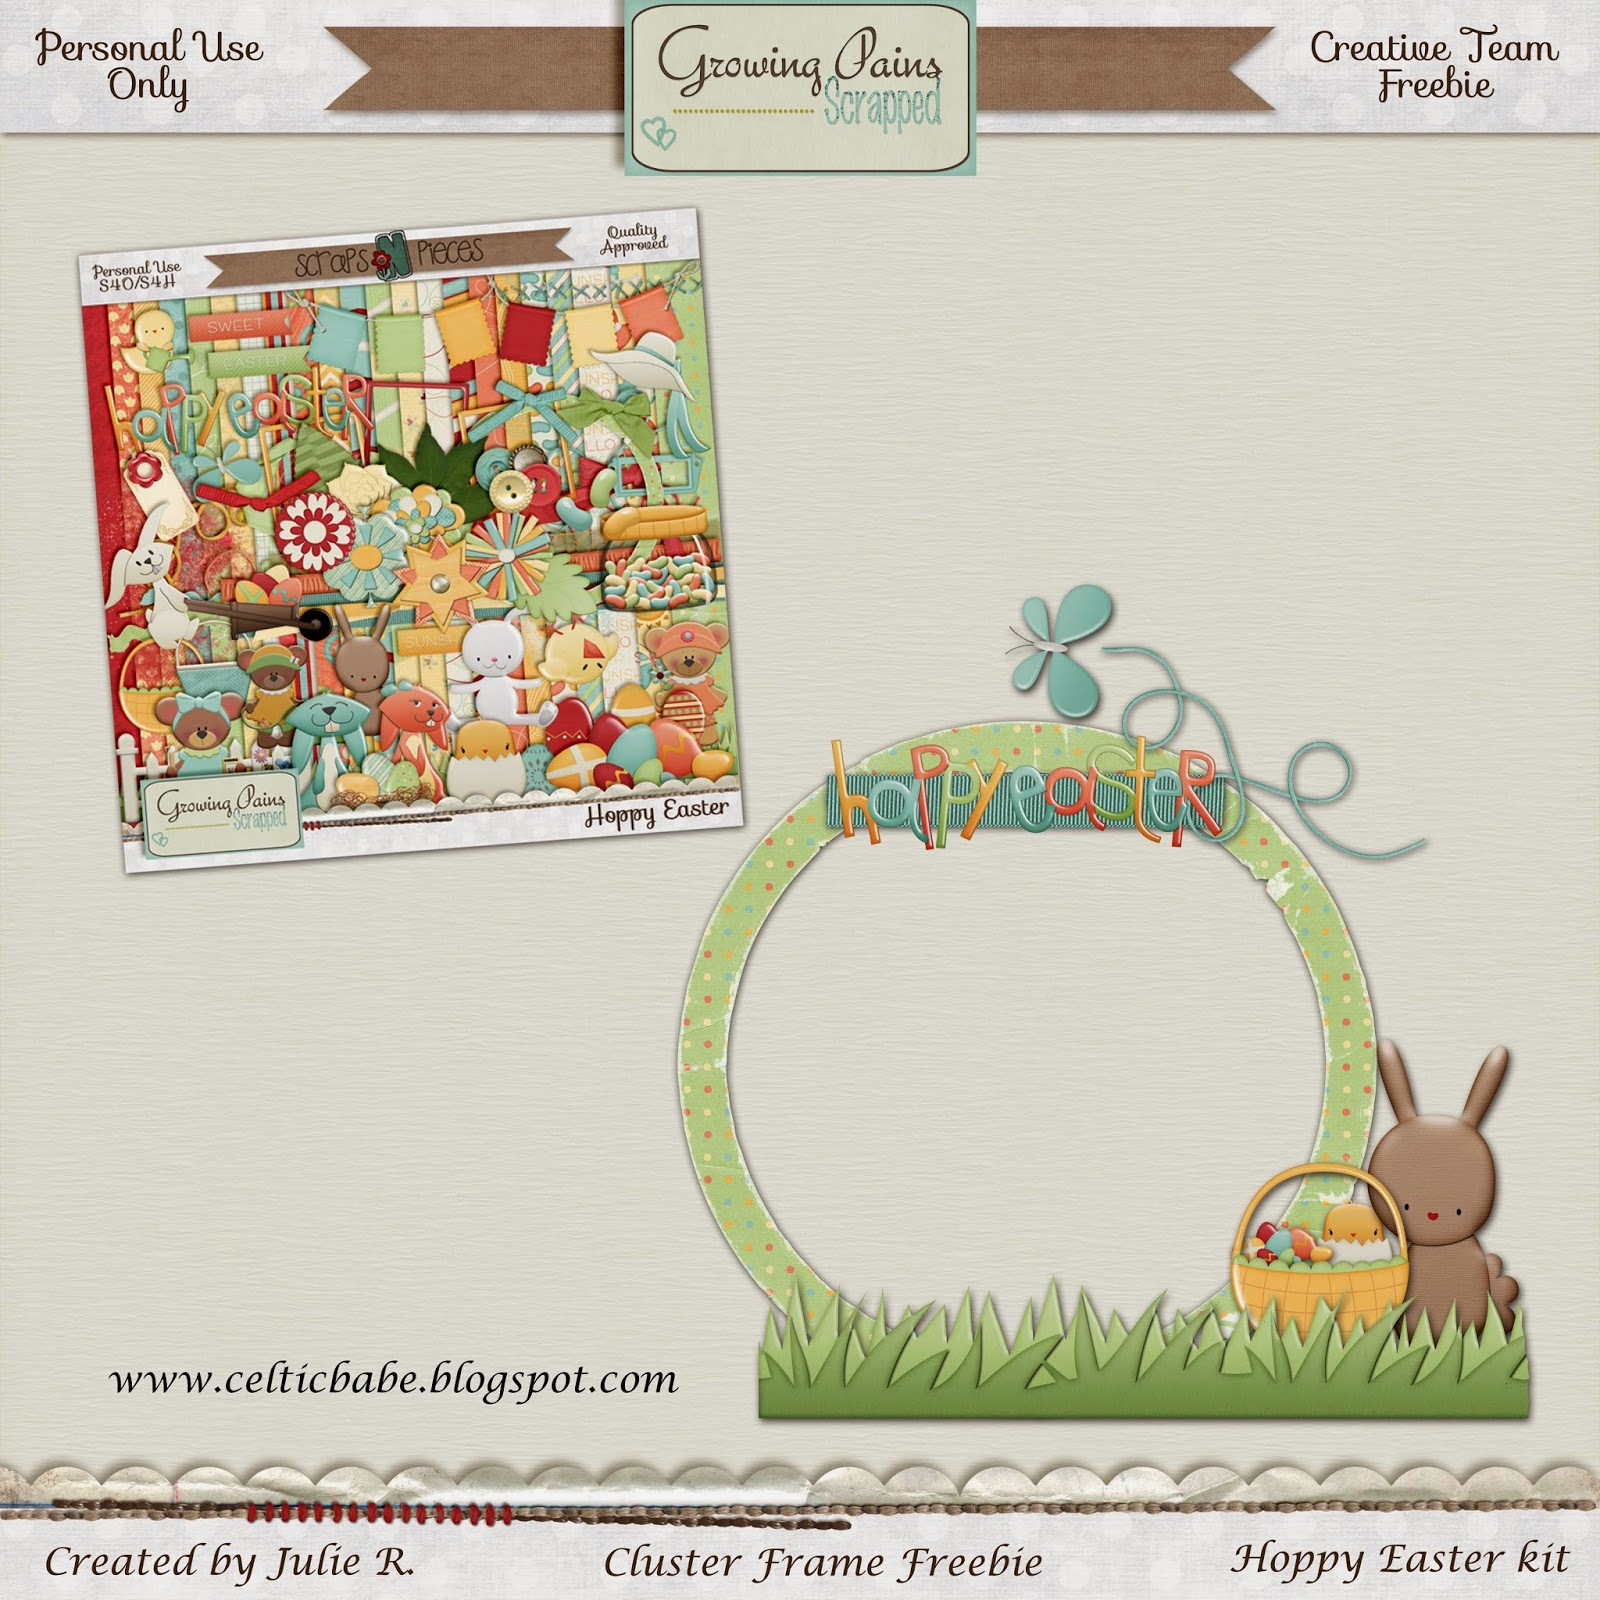 http://4.bp.blogspot.com/-U1wCu0SdAzQ/UzWjEON6qtI/AAAAAAAABRM/iYEGXV4Ouwg/s1600/Hoppy+Easter+Freebie+Preview.jpg